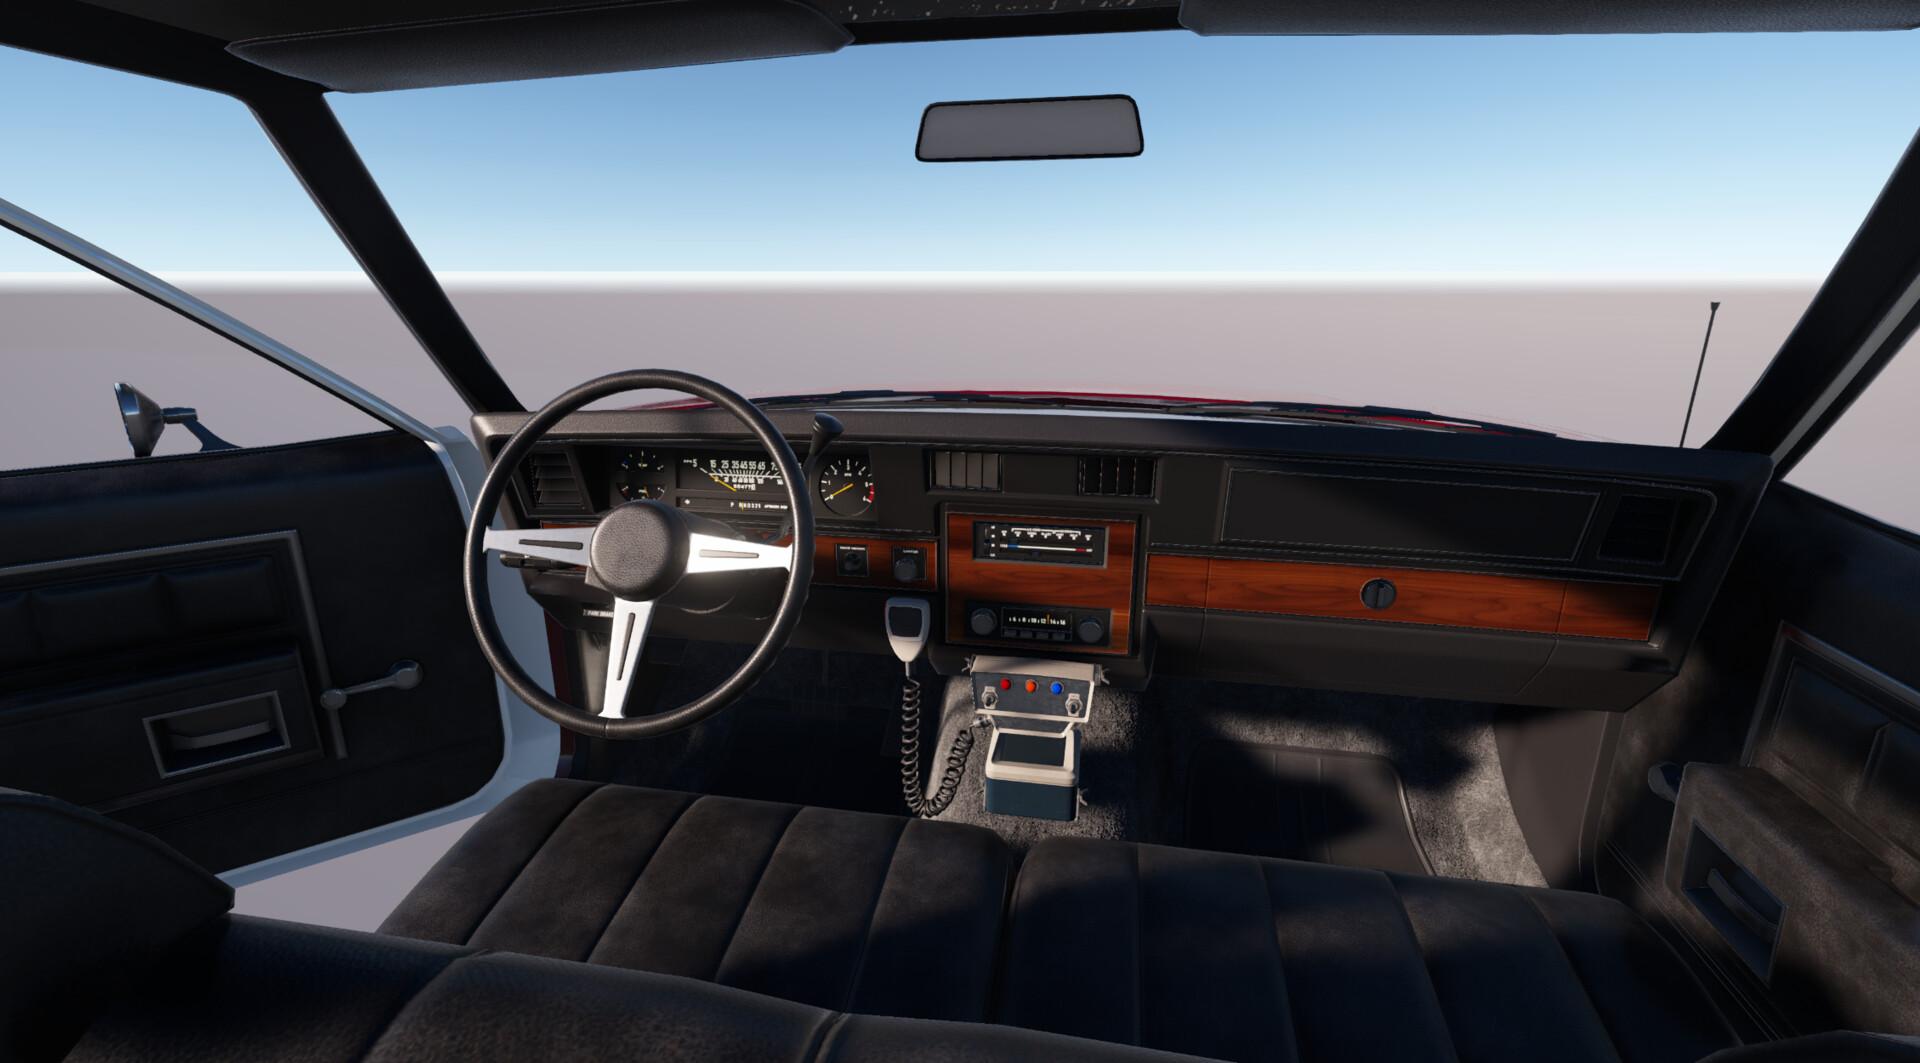 ArtStation - Police Car - Fargo Tribute, PADDINGSONS Outsourcing